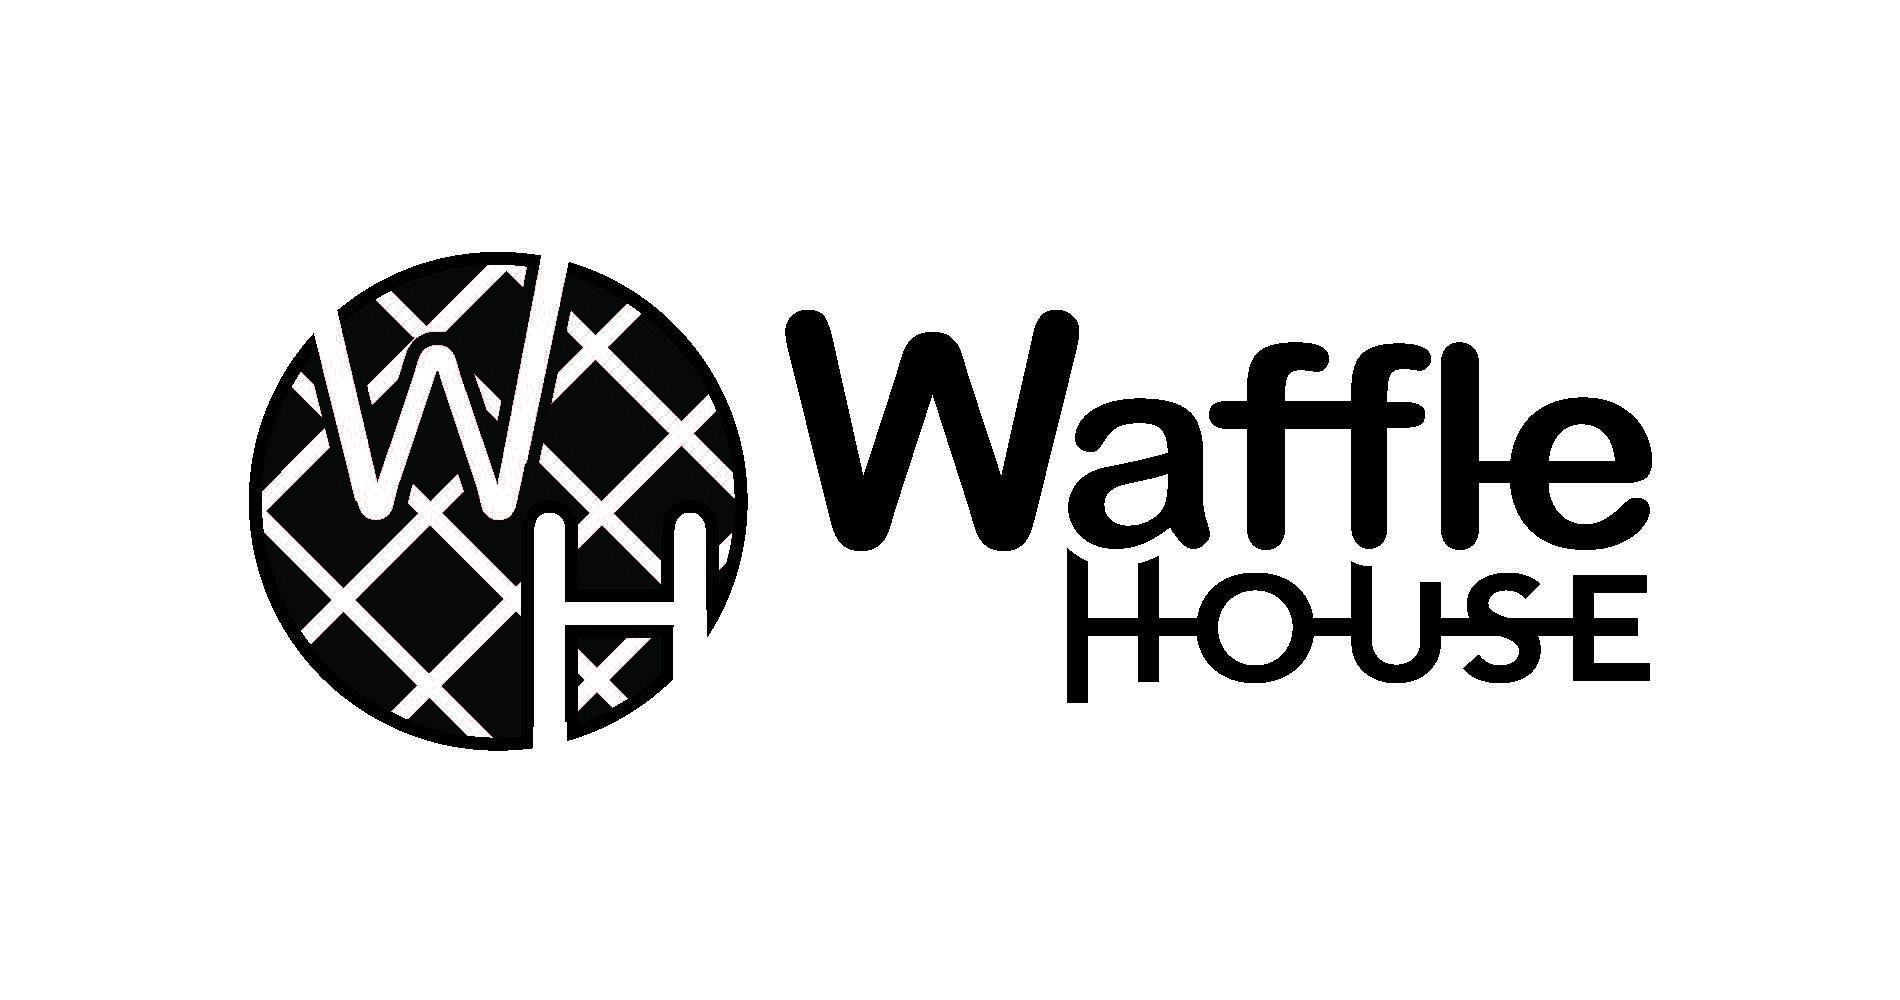 Waffle House Logos_Page_1